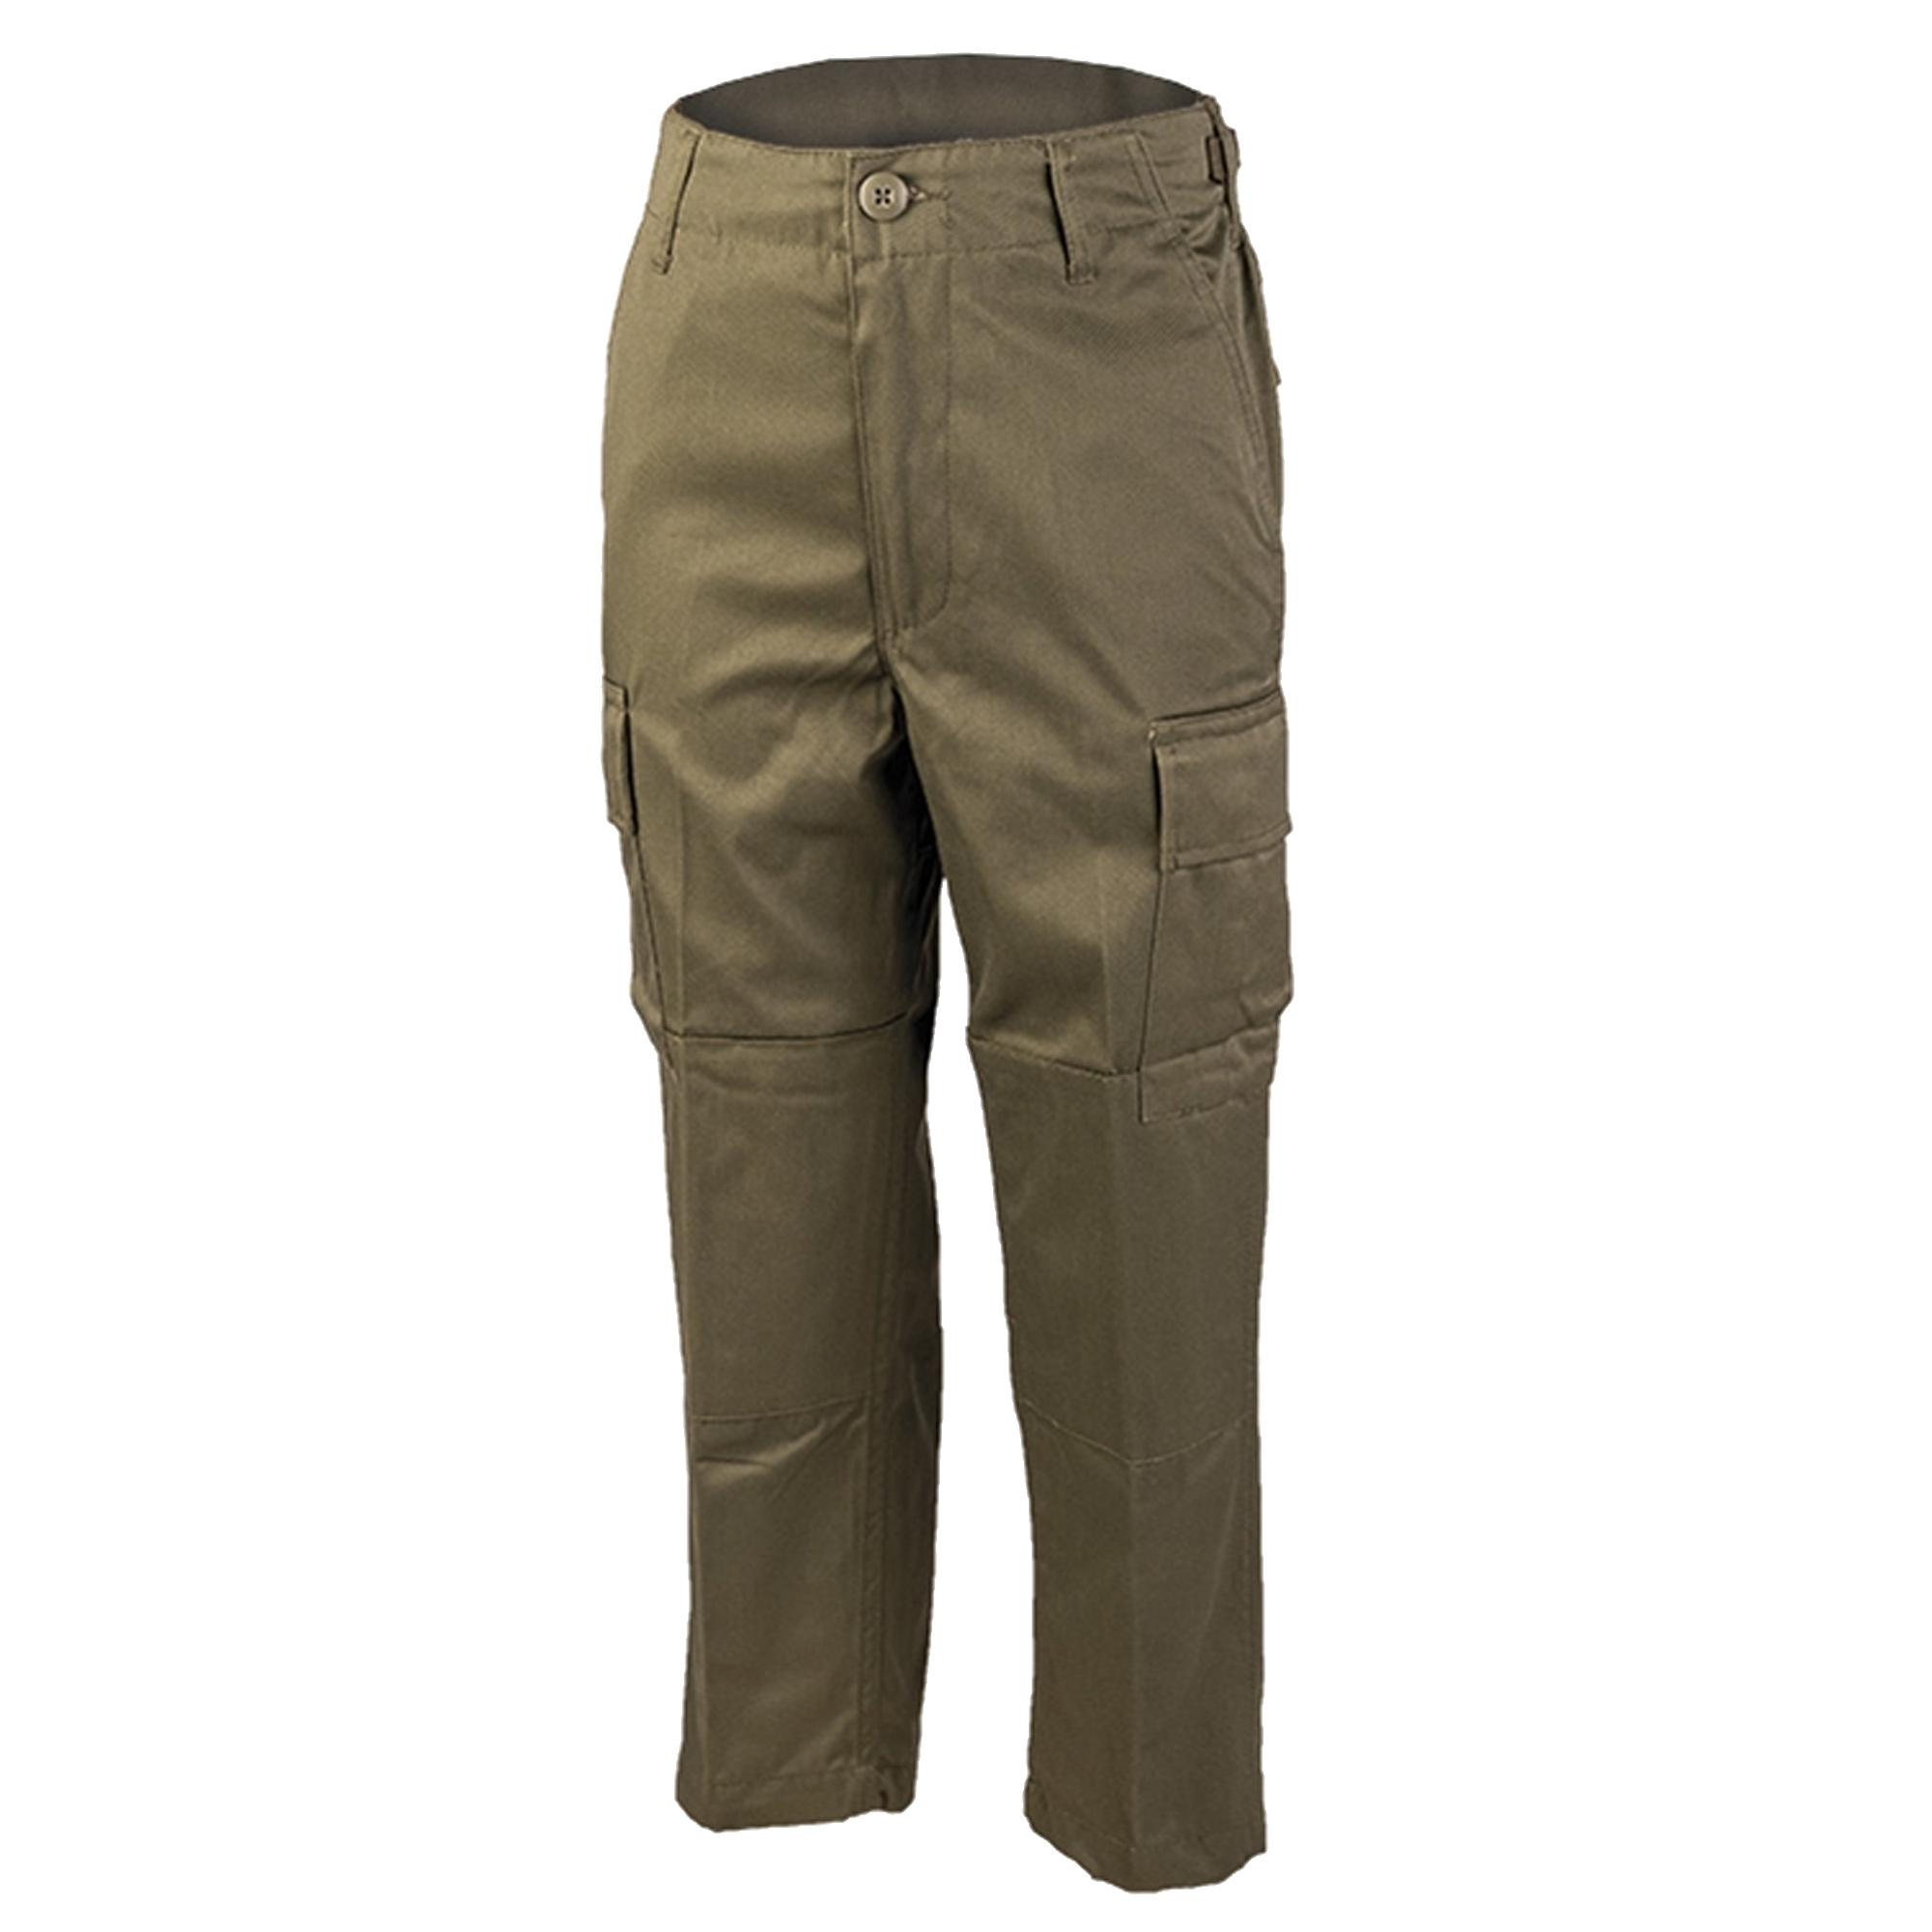 Pantalón BDU para niños - verde oliva